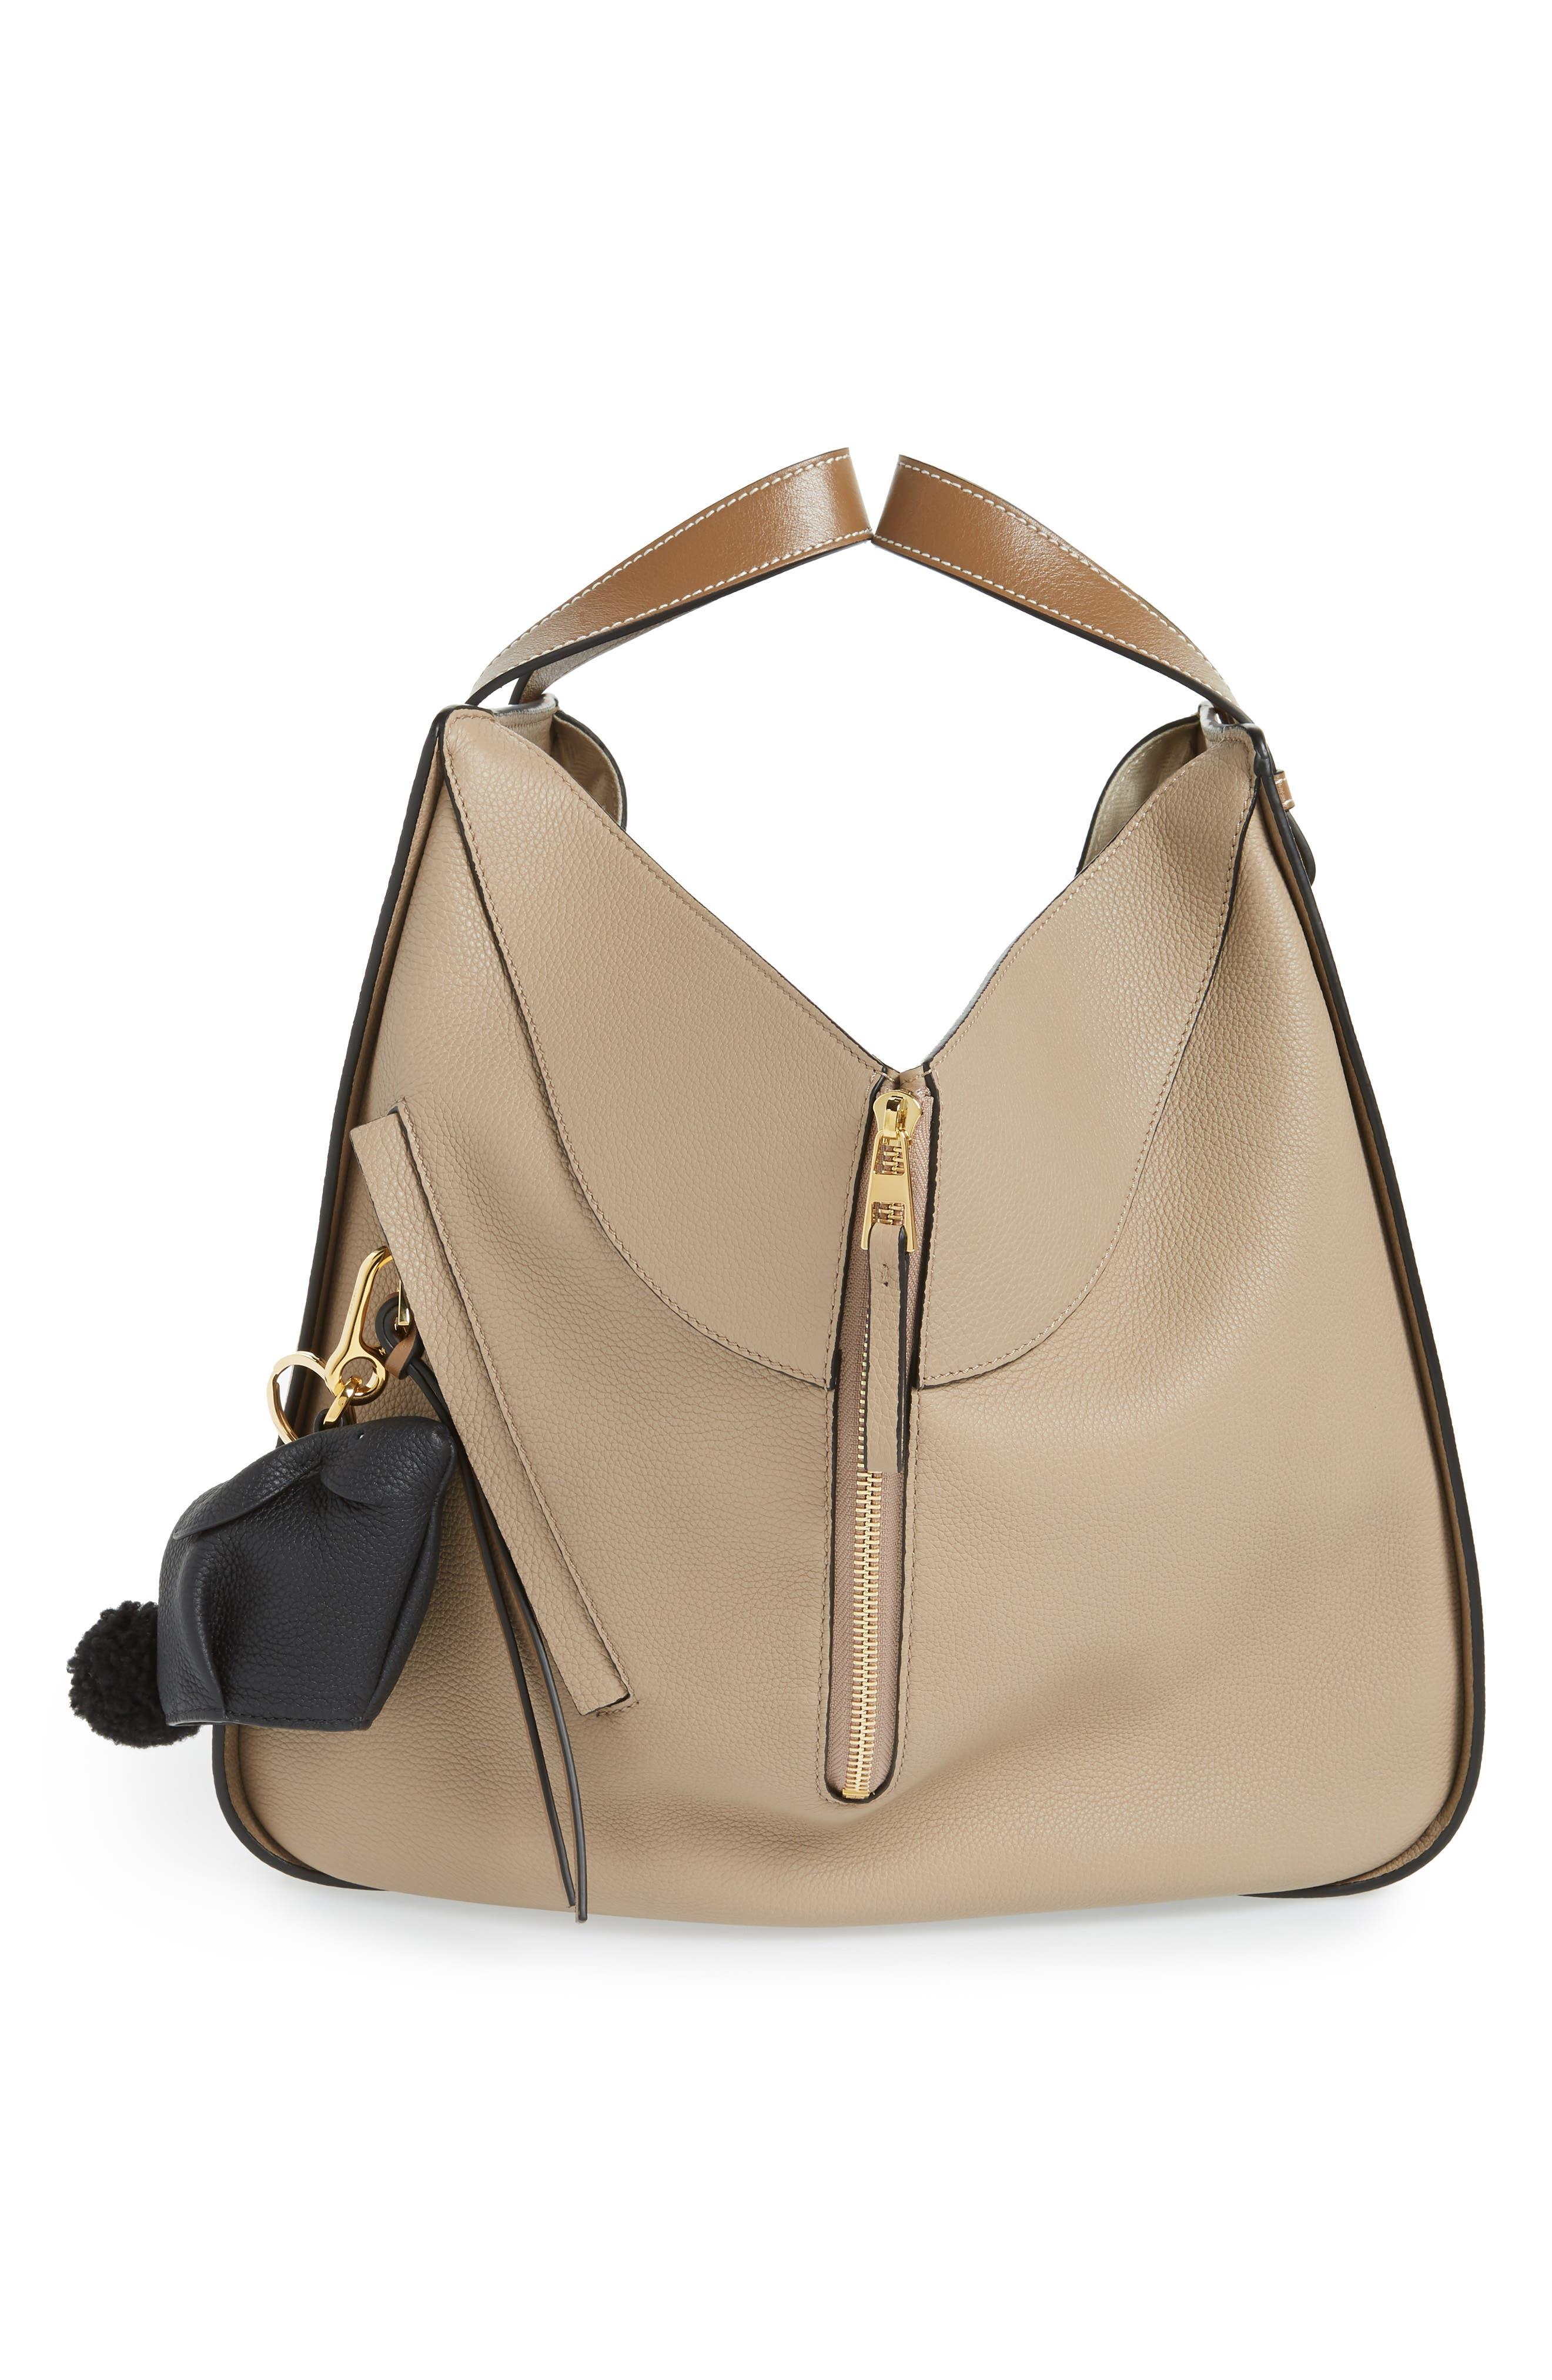 Women s  300 –  500 Designer Handbags   Wallets  9c8fca902bf47